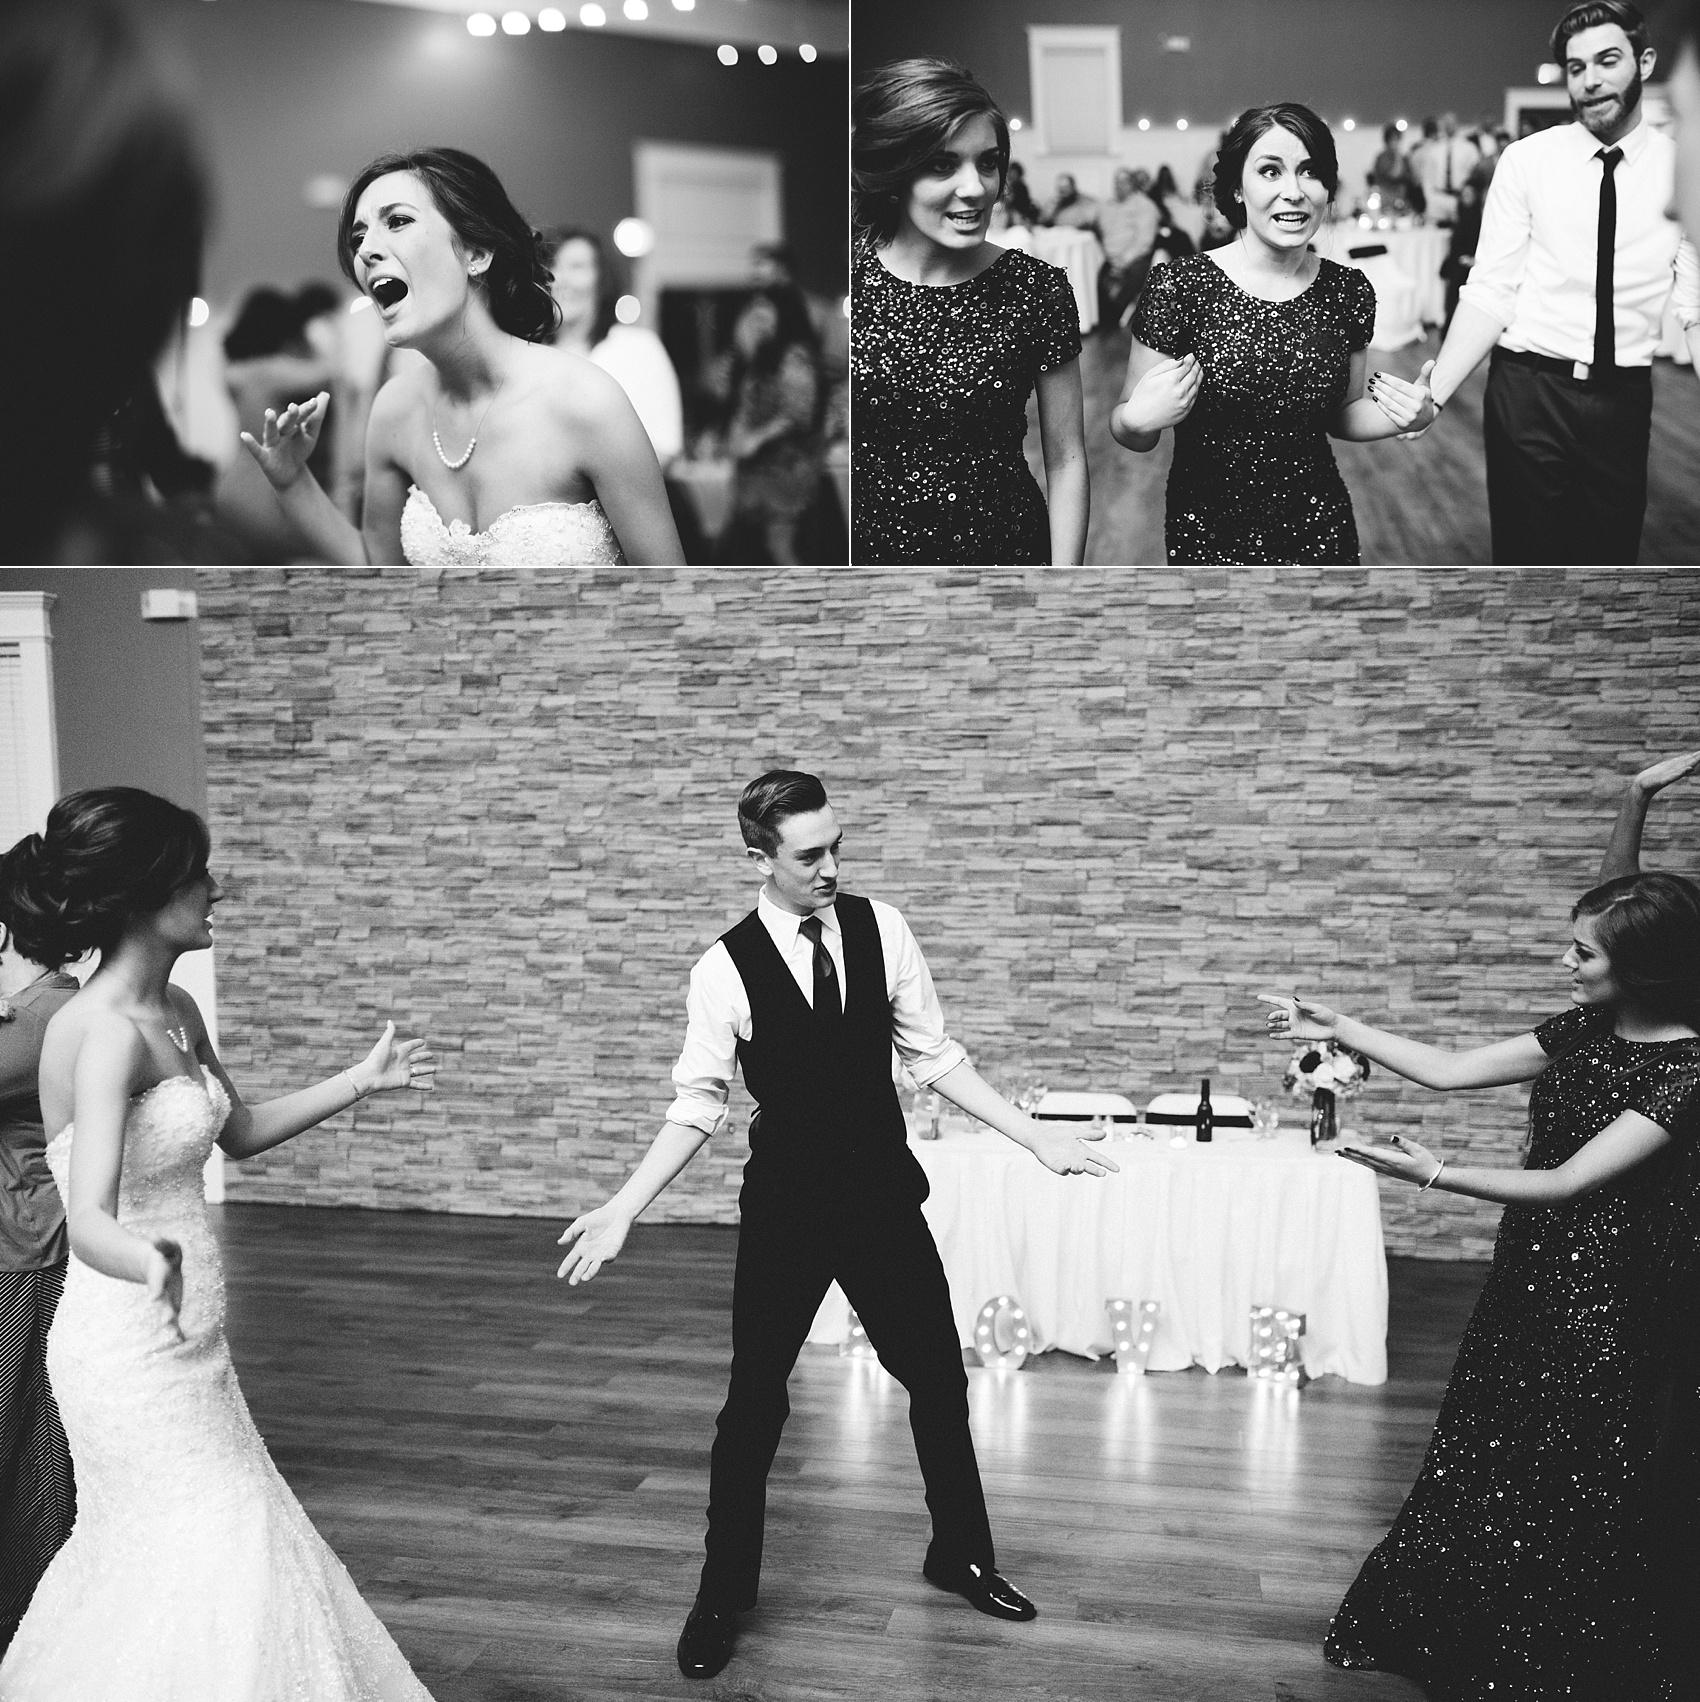 dwayne lydia delaware wedding philadelphia baltimore washingtion dc wedding photographer-29